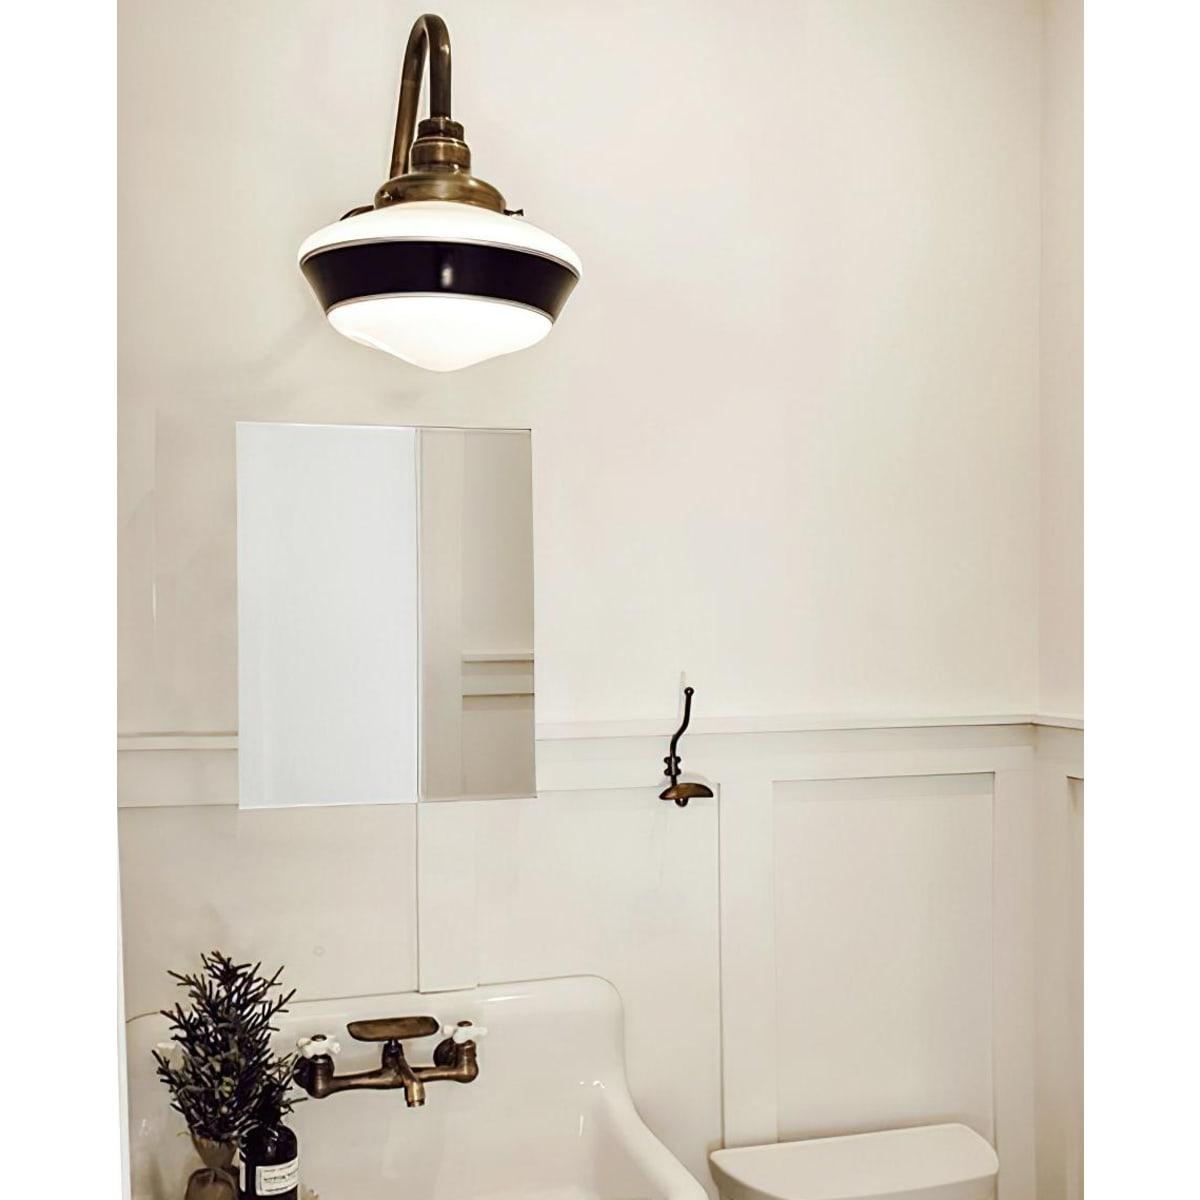 Зеркало без полки 30 см